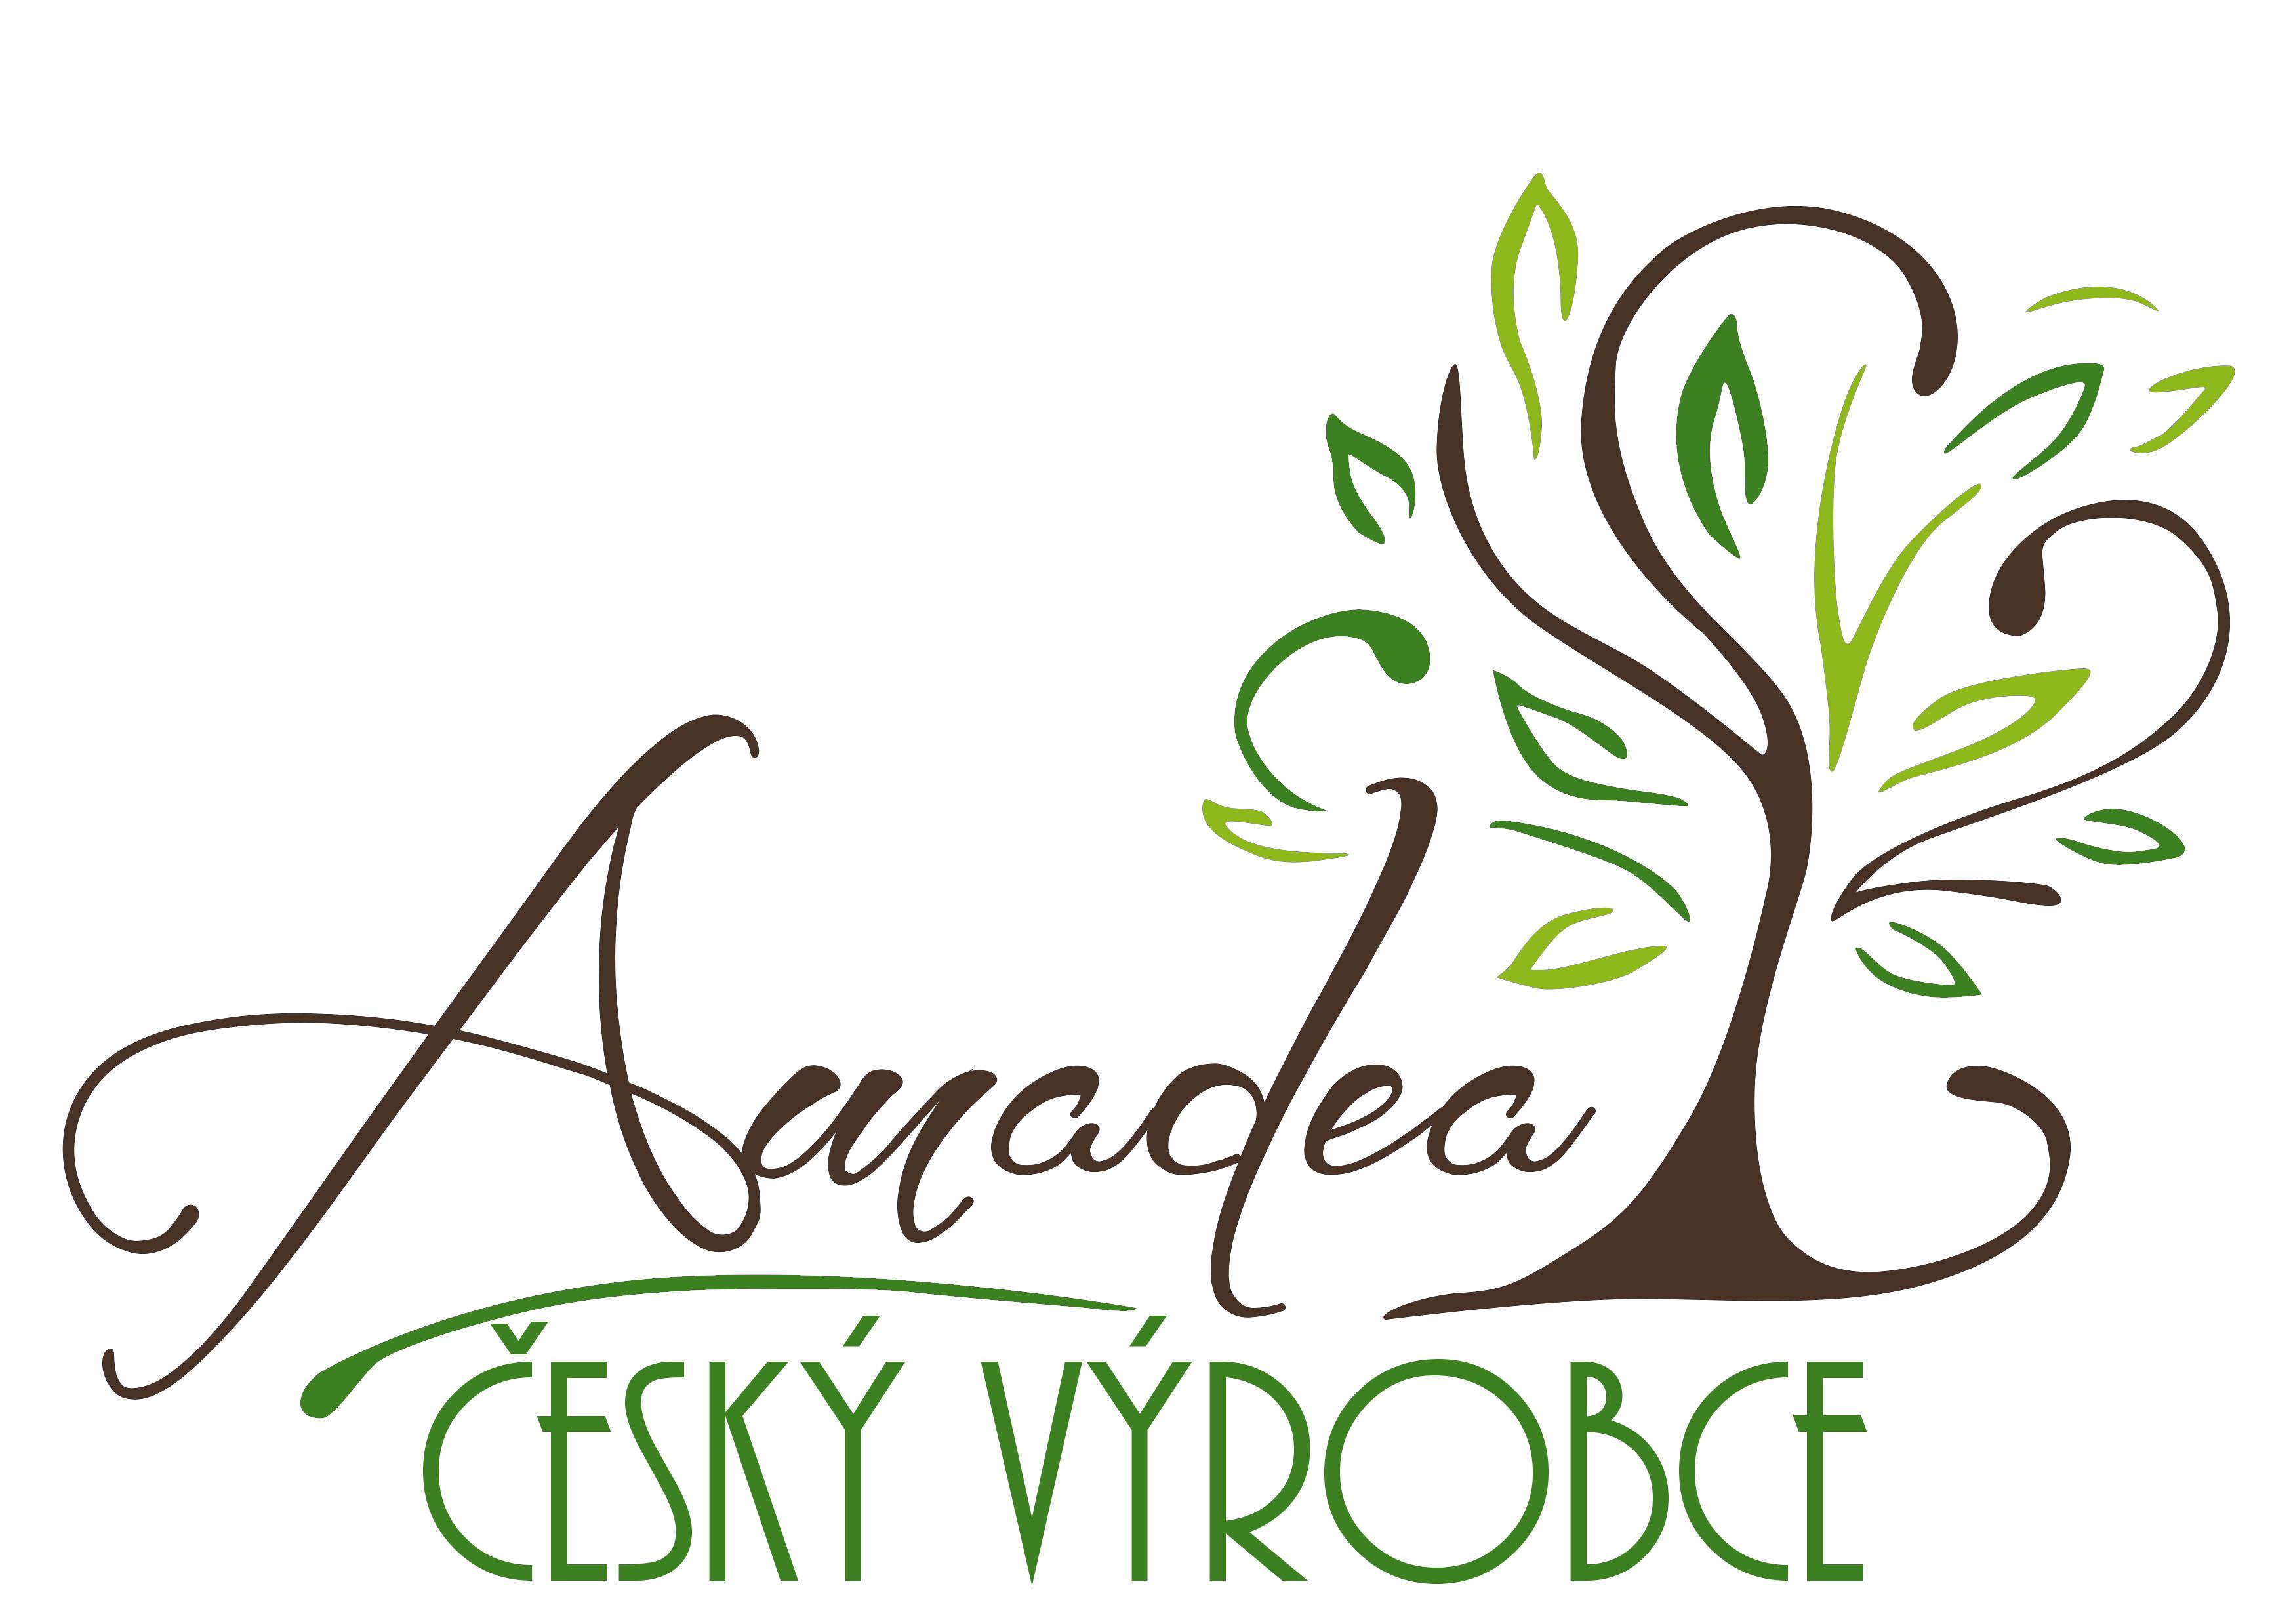 AMADEA-cesky vyrobce